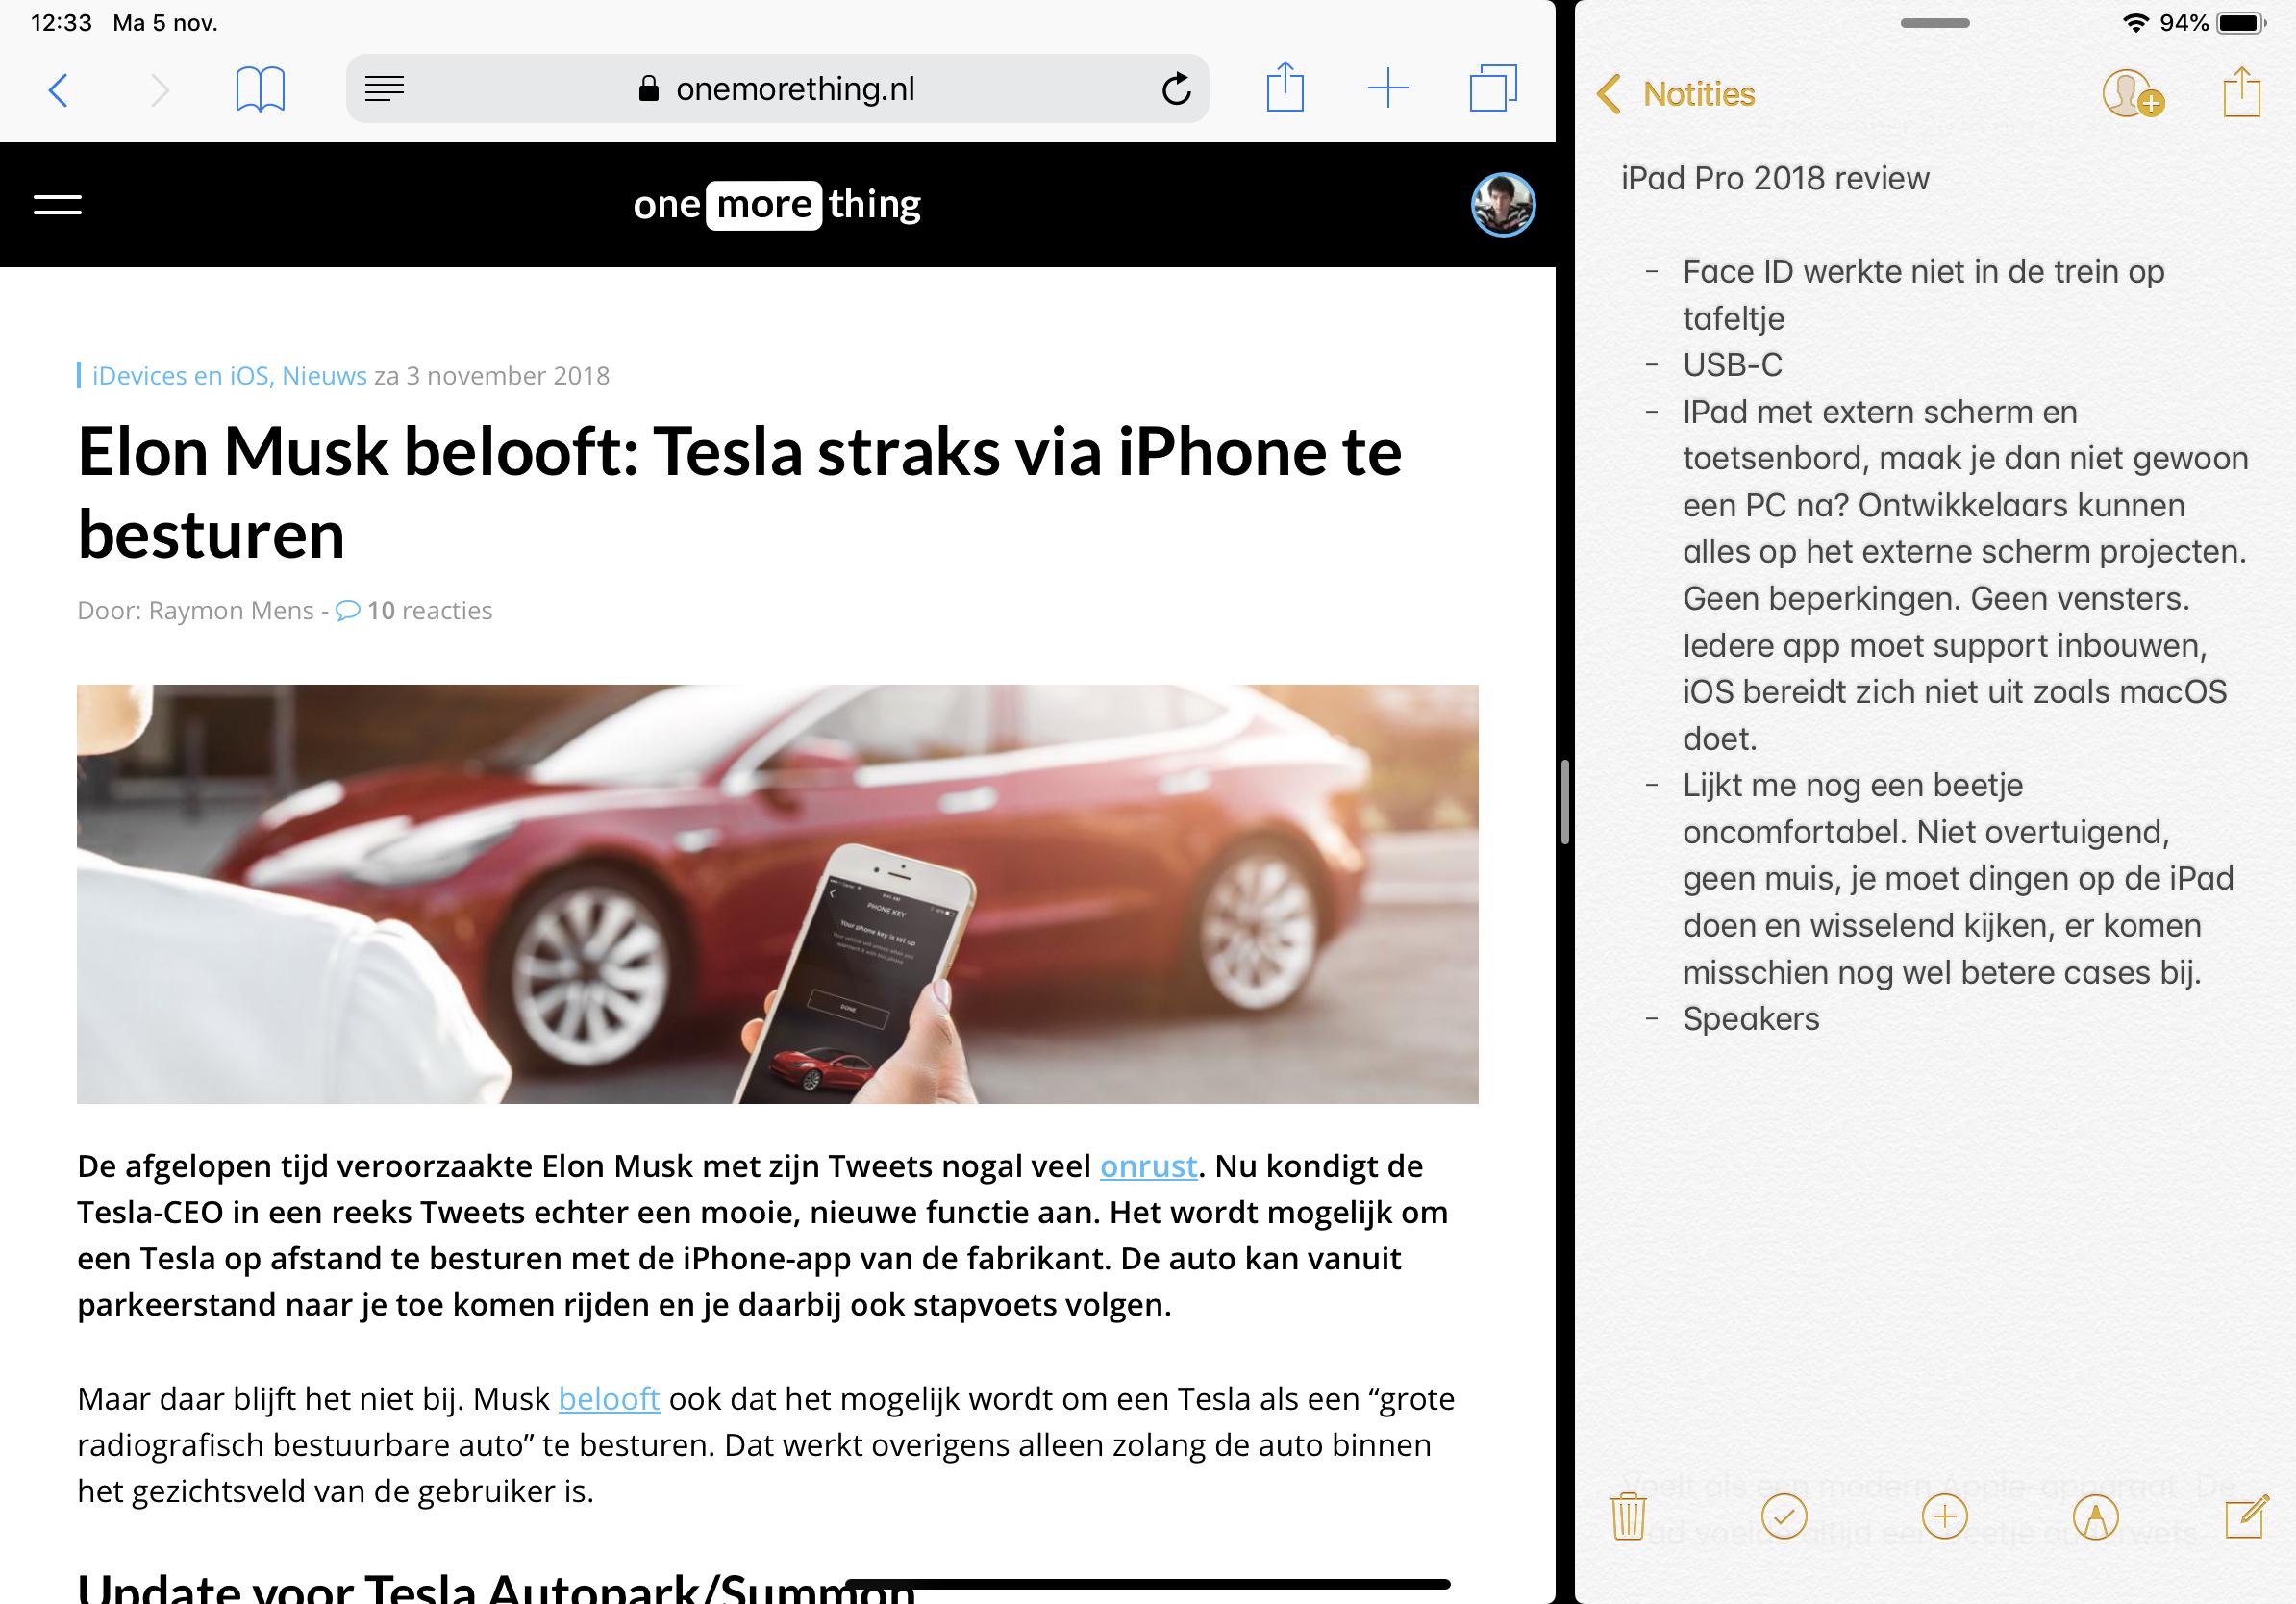 iOS 13 multitasking